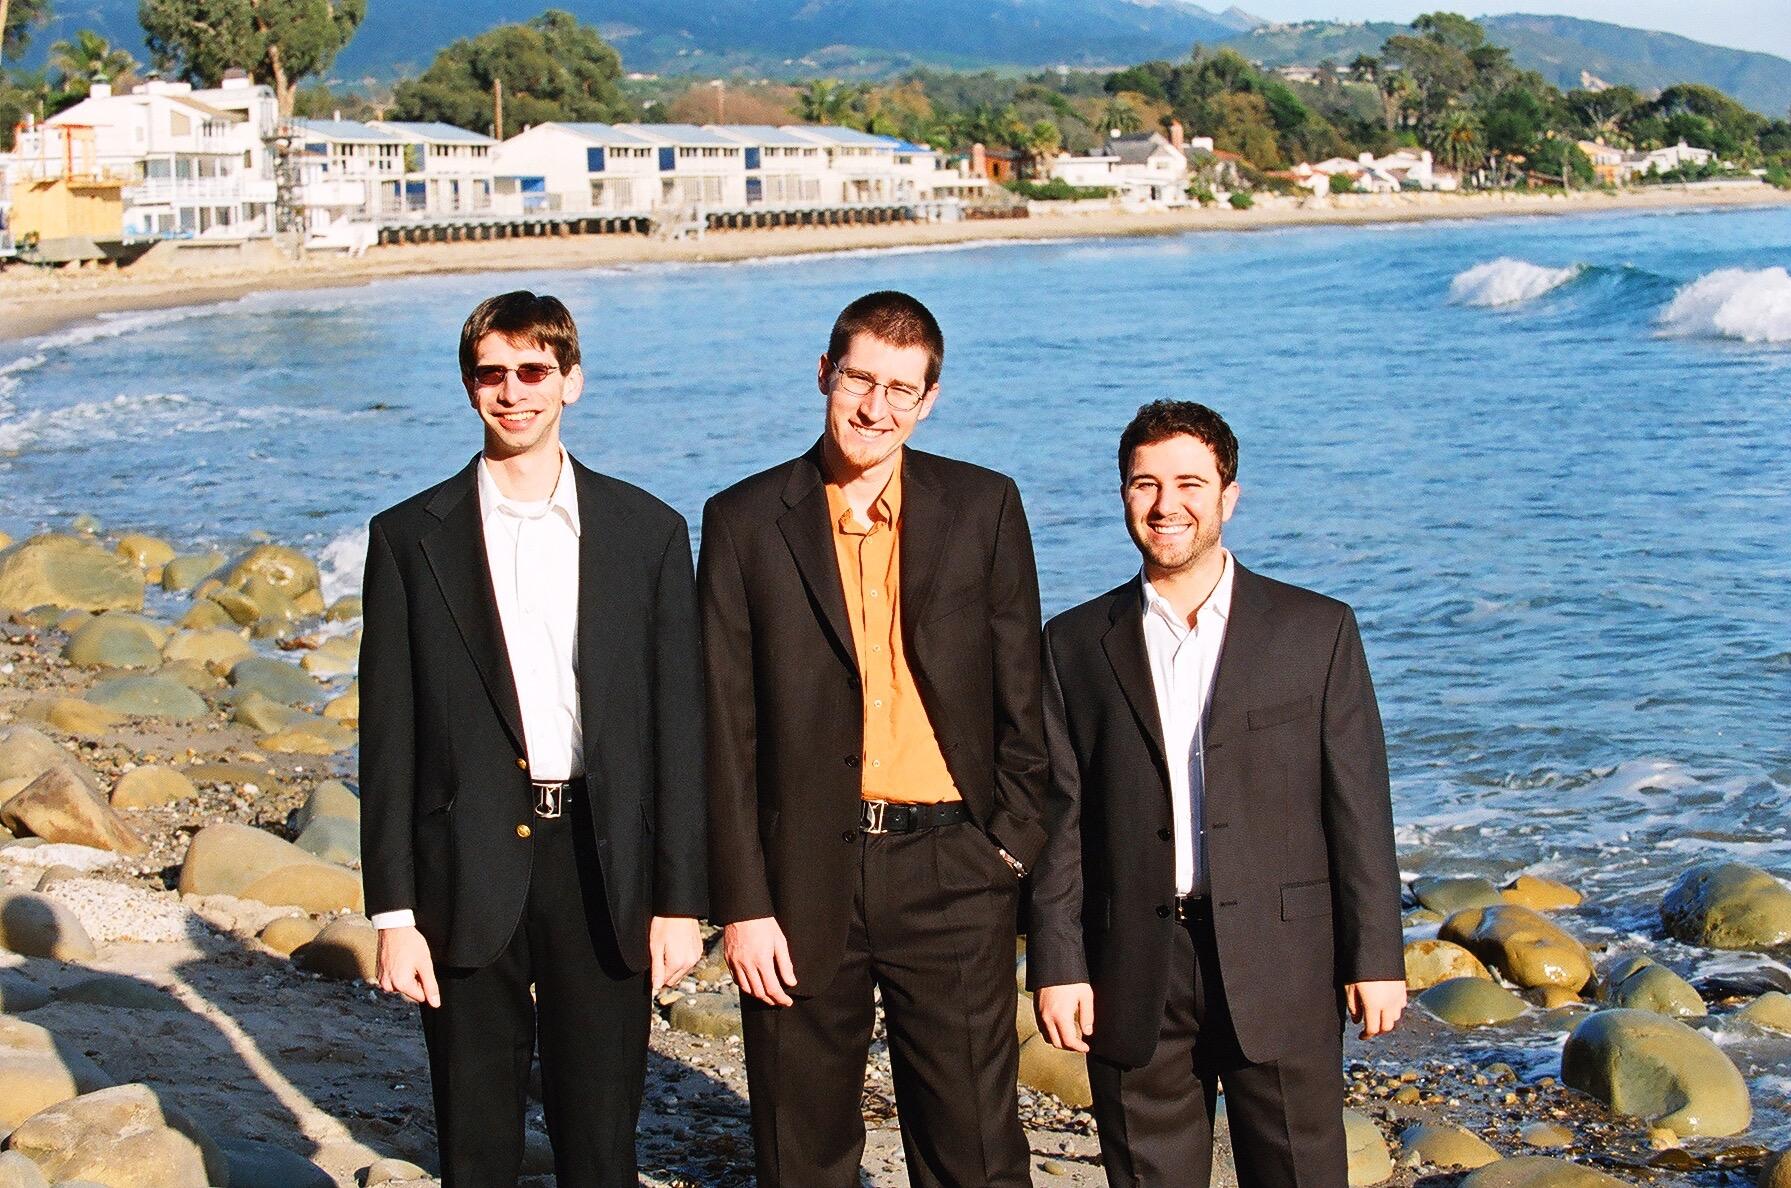 Jacob Tell, Sean Campos, Mike Wald